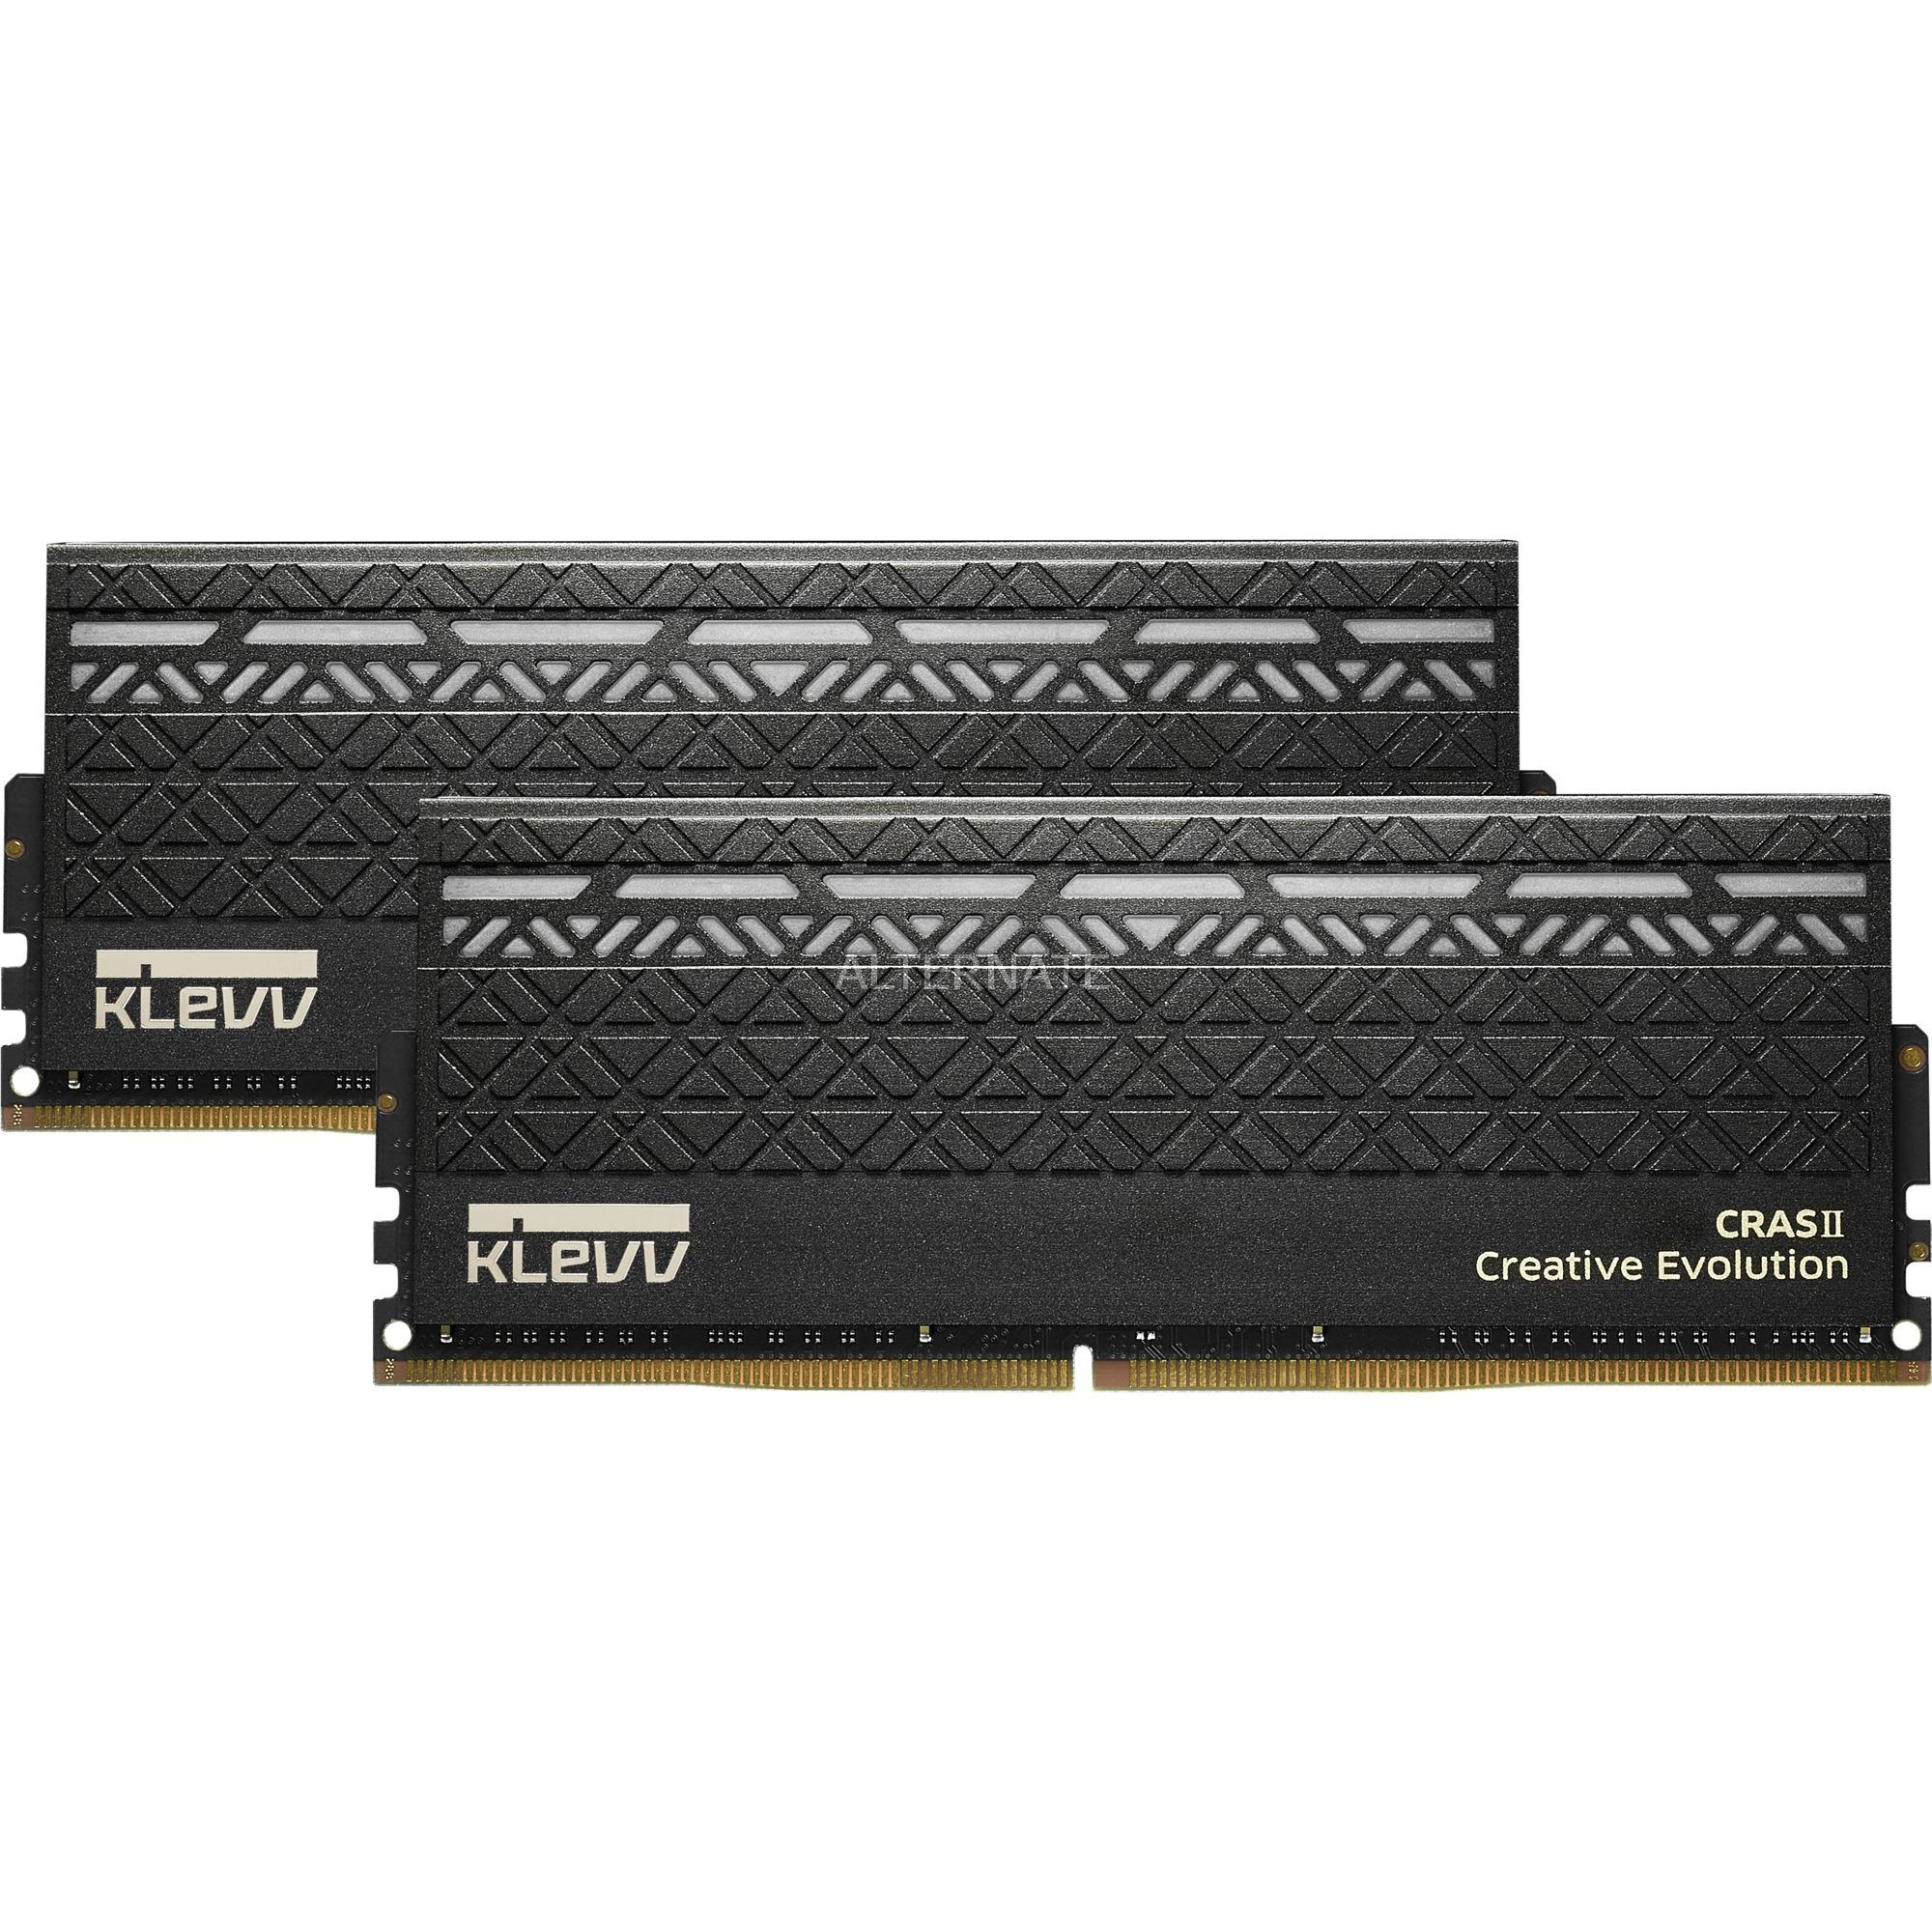 KM4Z16X2A-3000-15-16-16-36-1, Memoria RAM